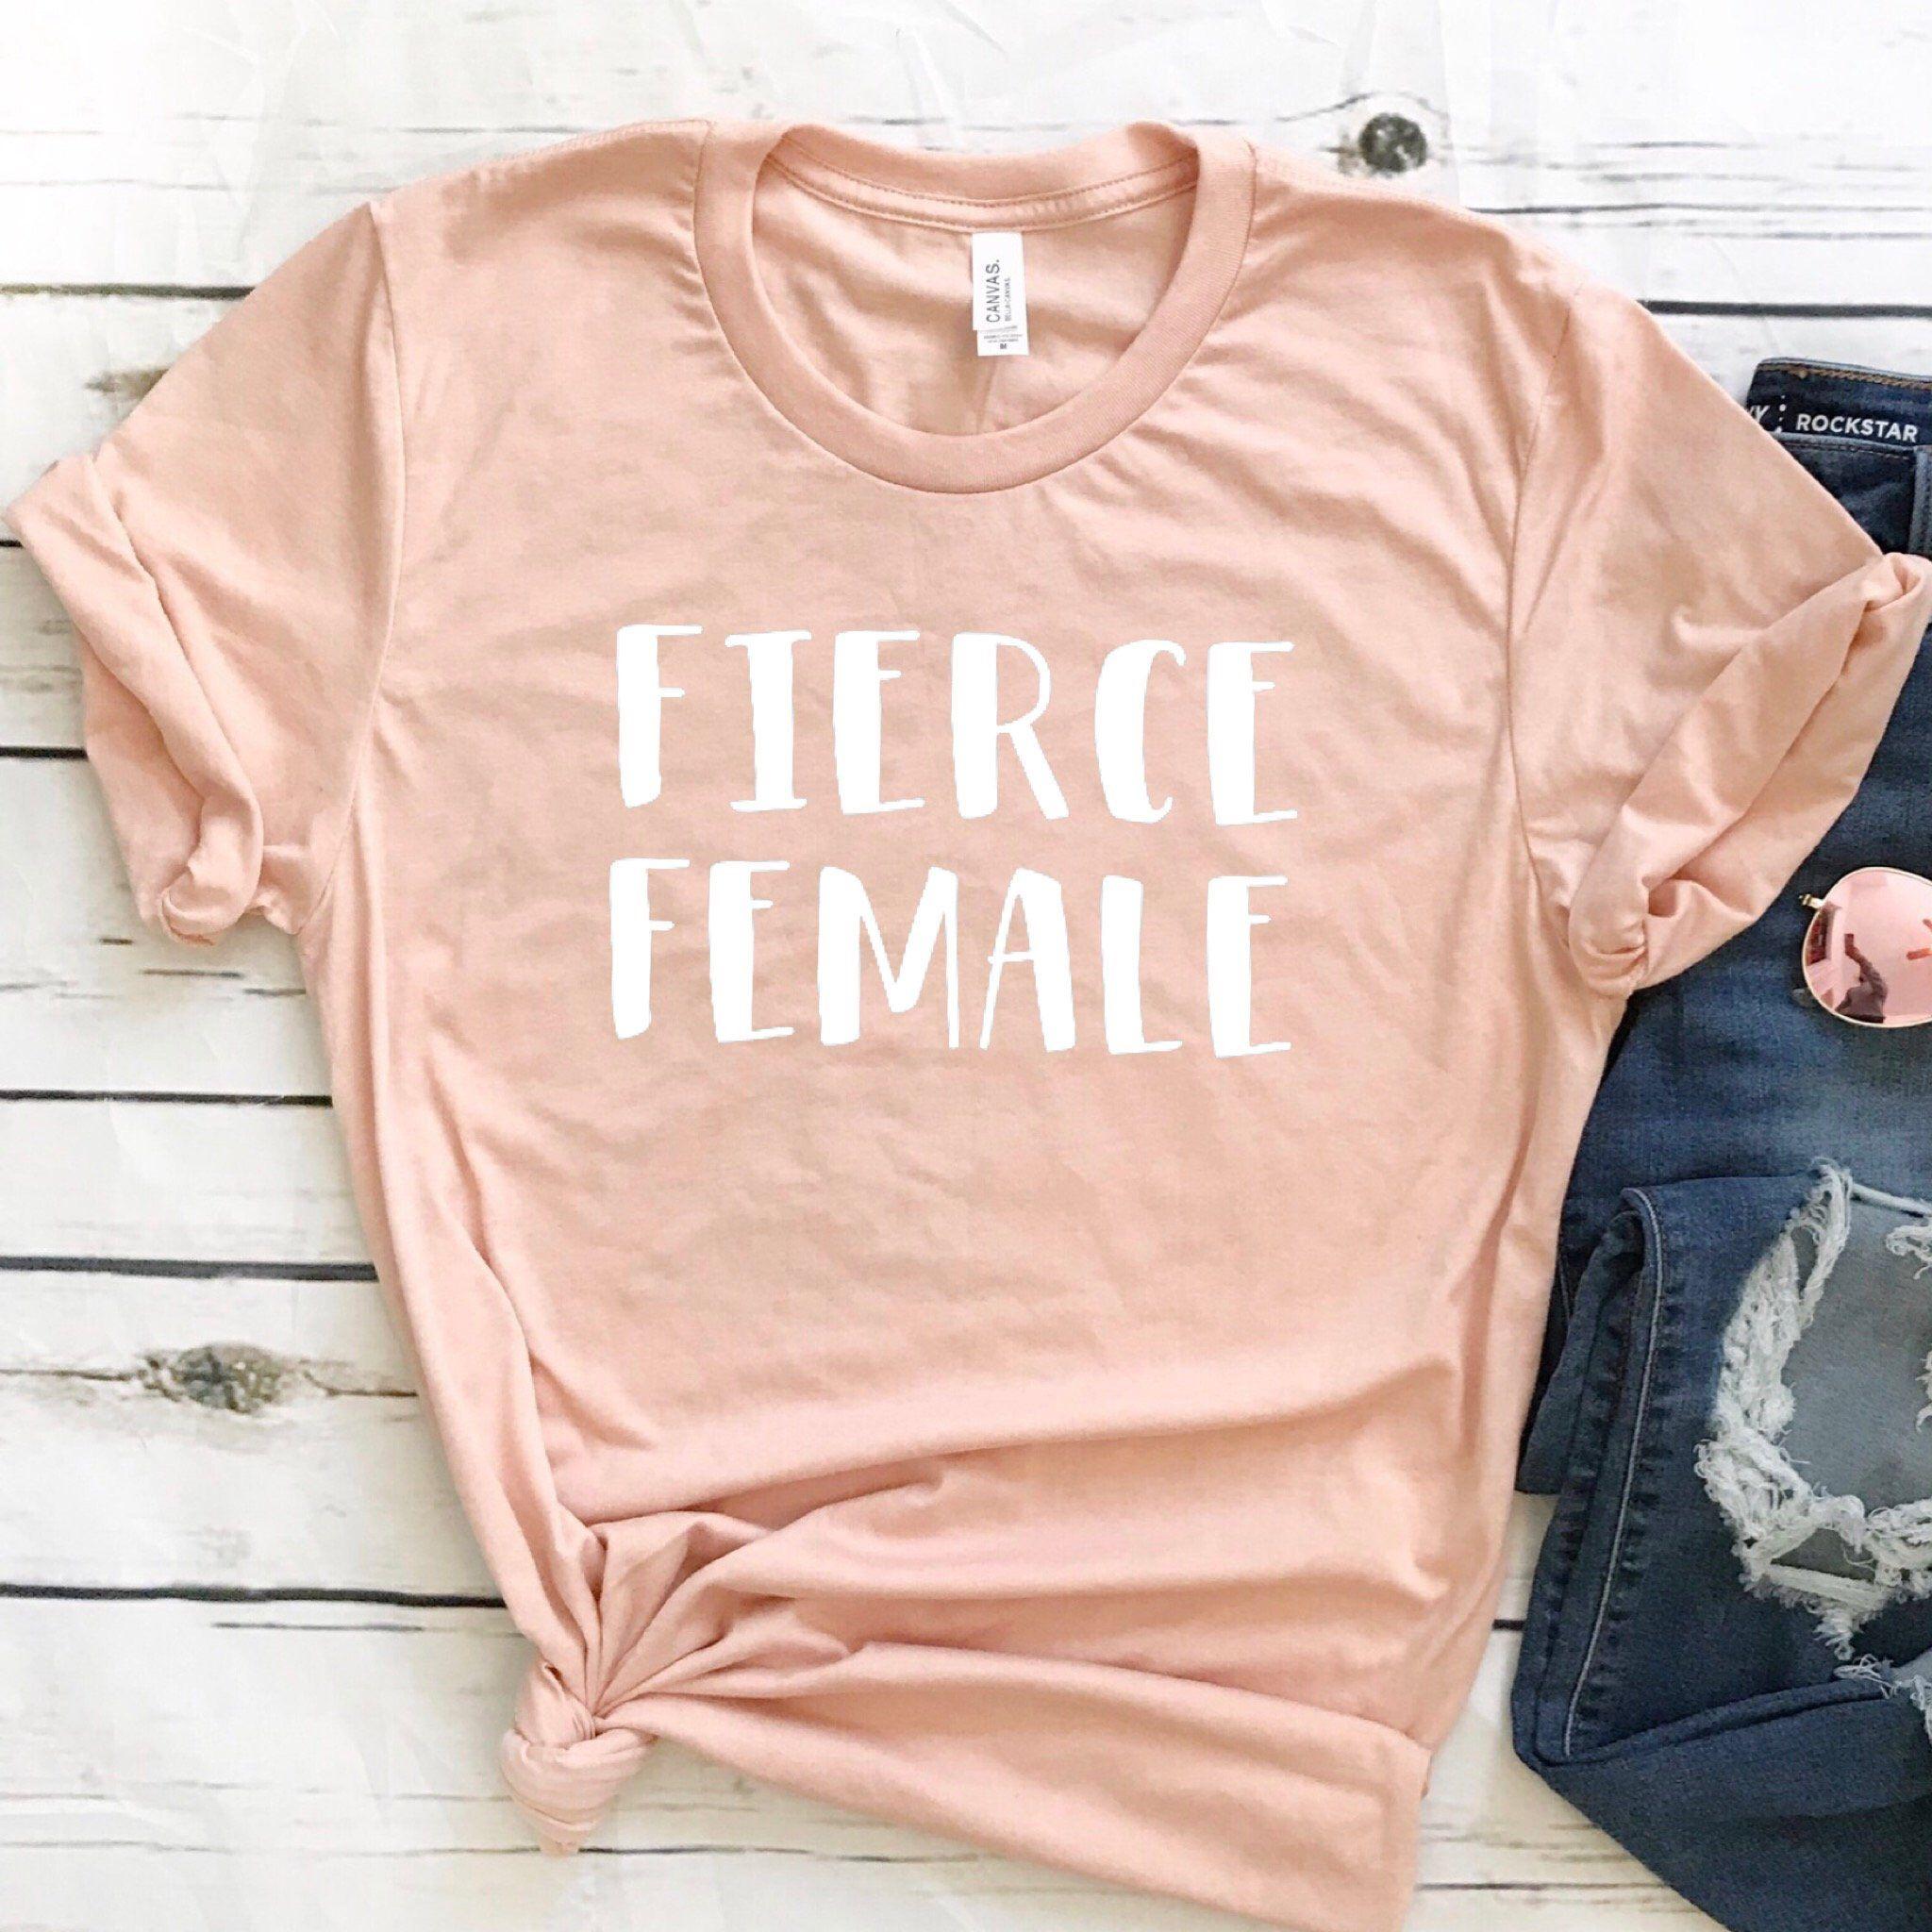 Fierce female shirt , Feminist shirt , Female empowerment